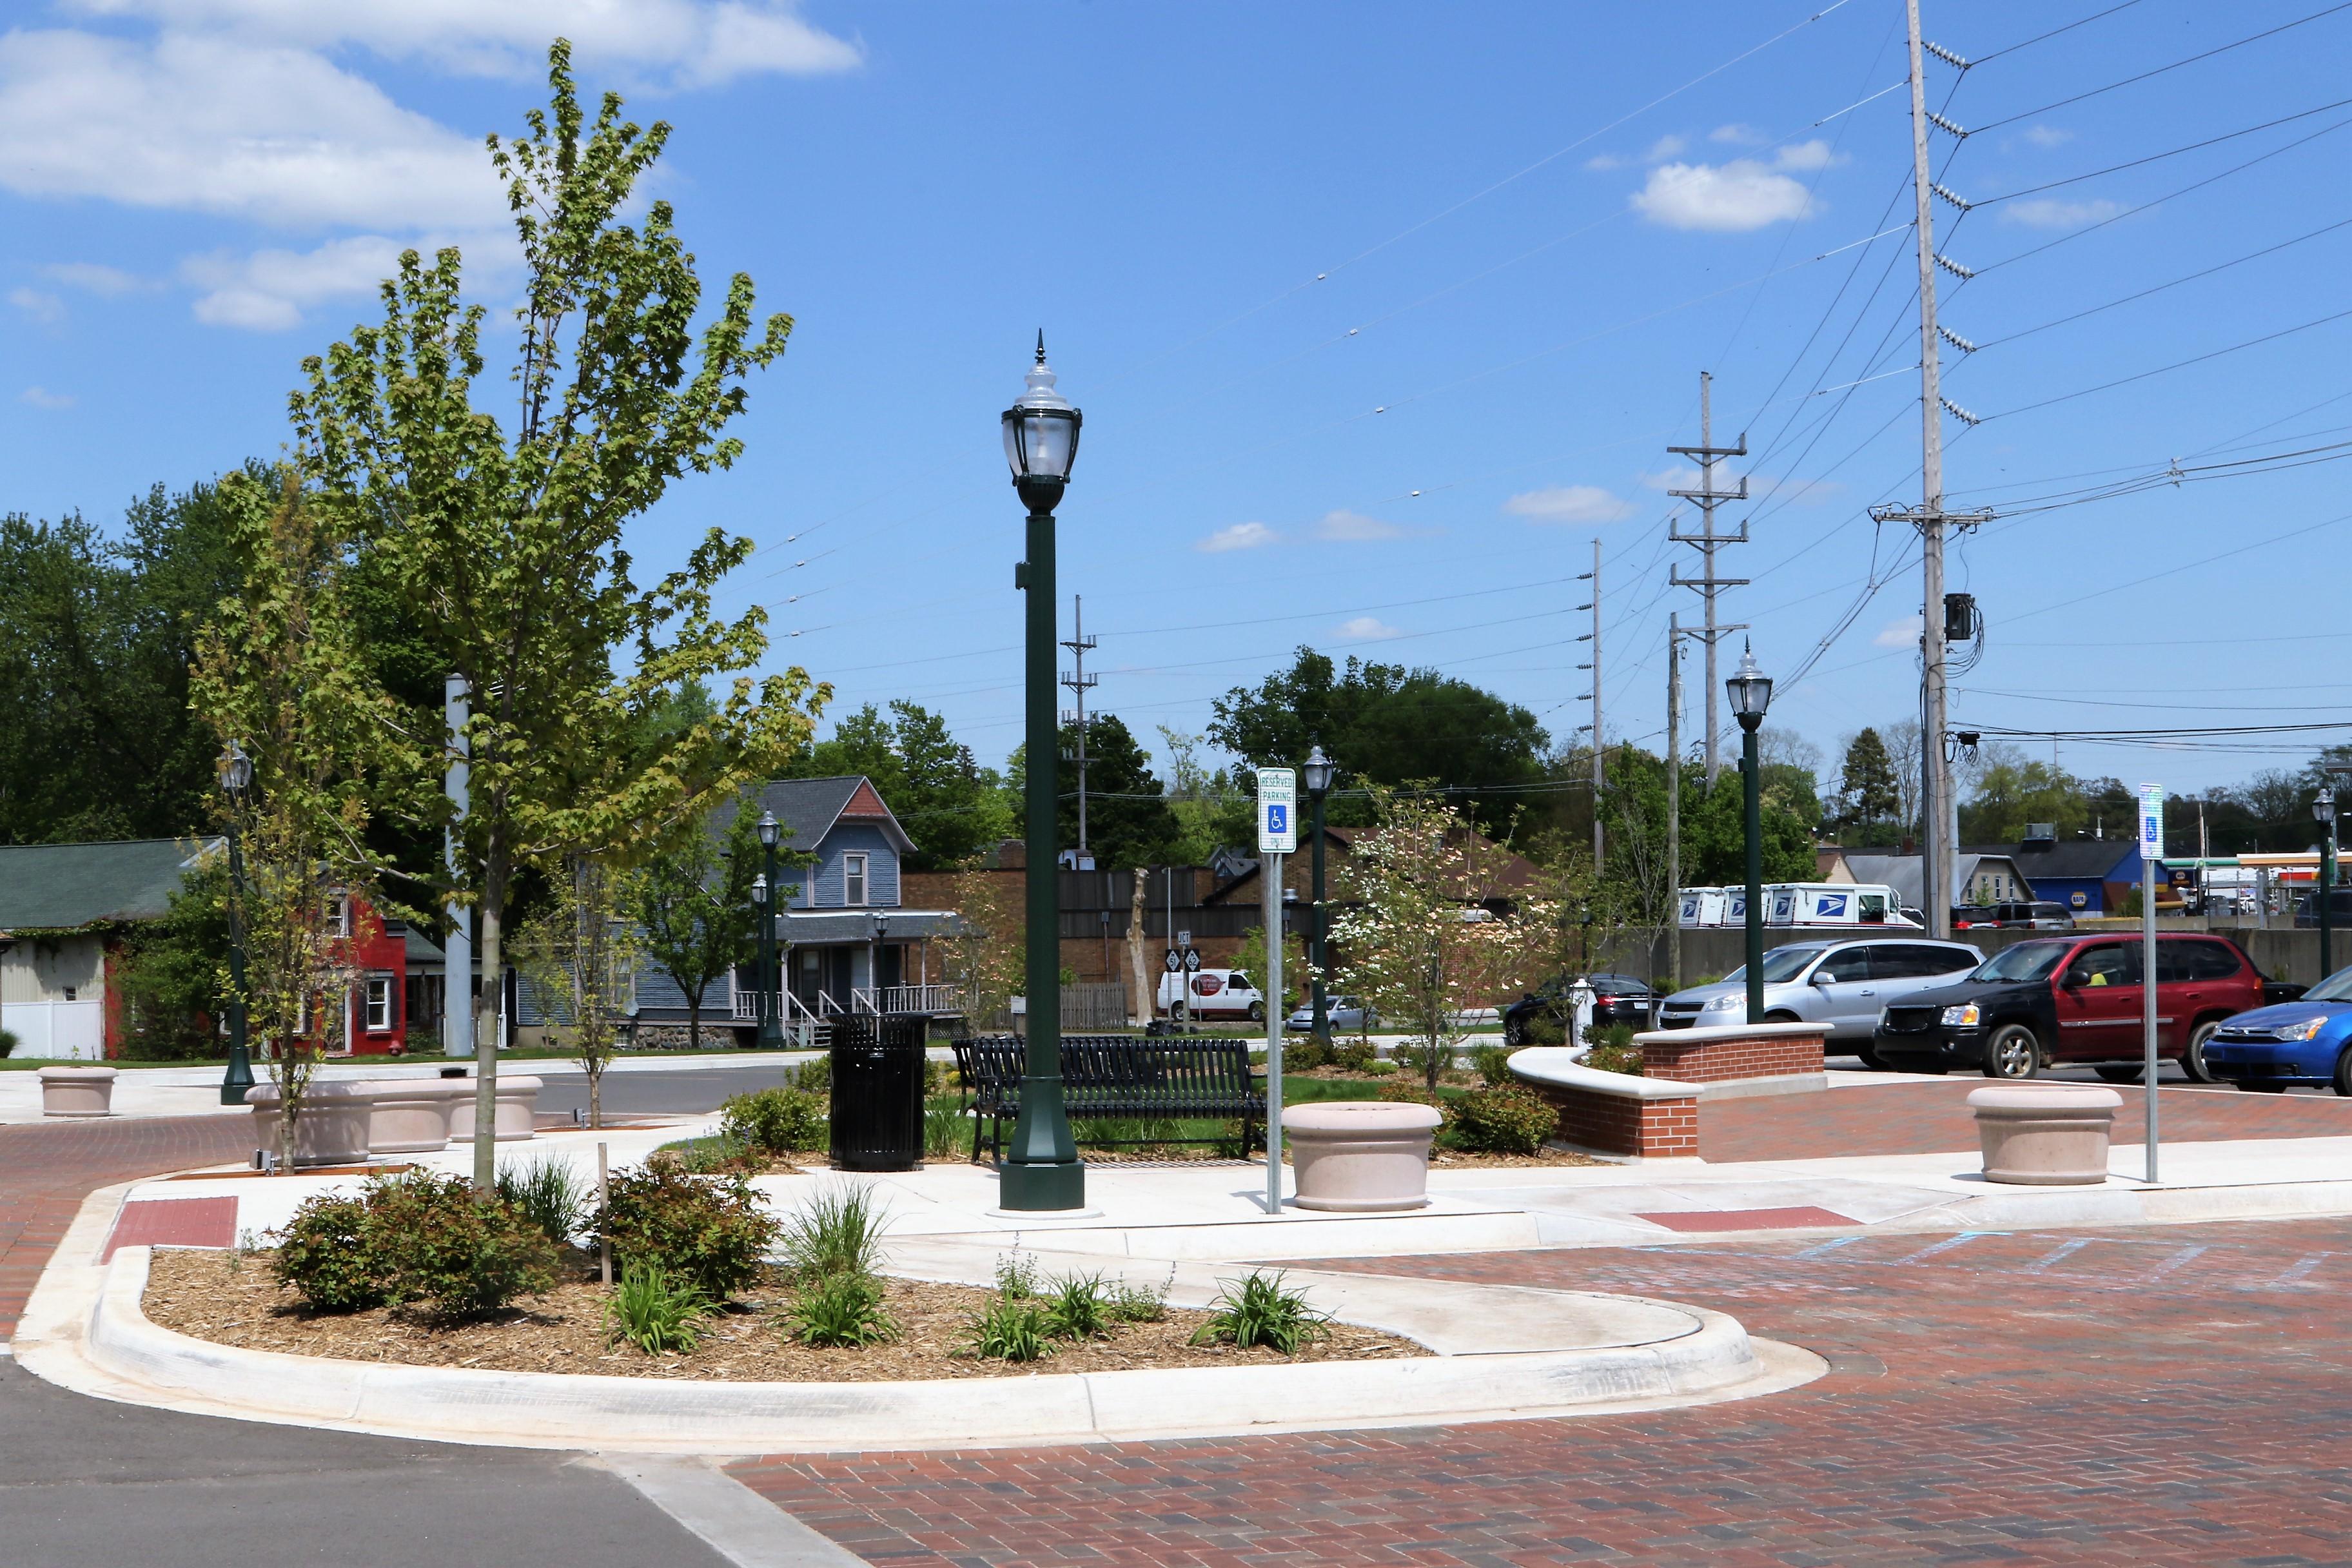 Dowagiac Quality of Life trees bricks lightpole curb